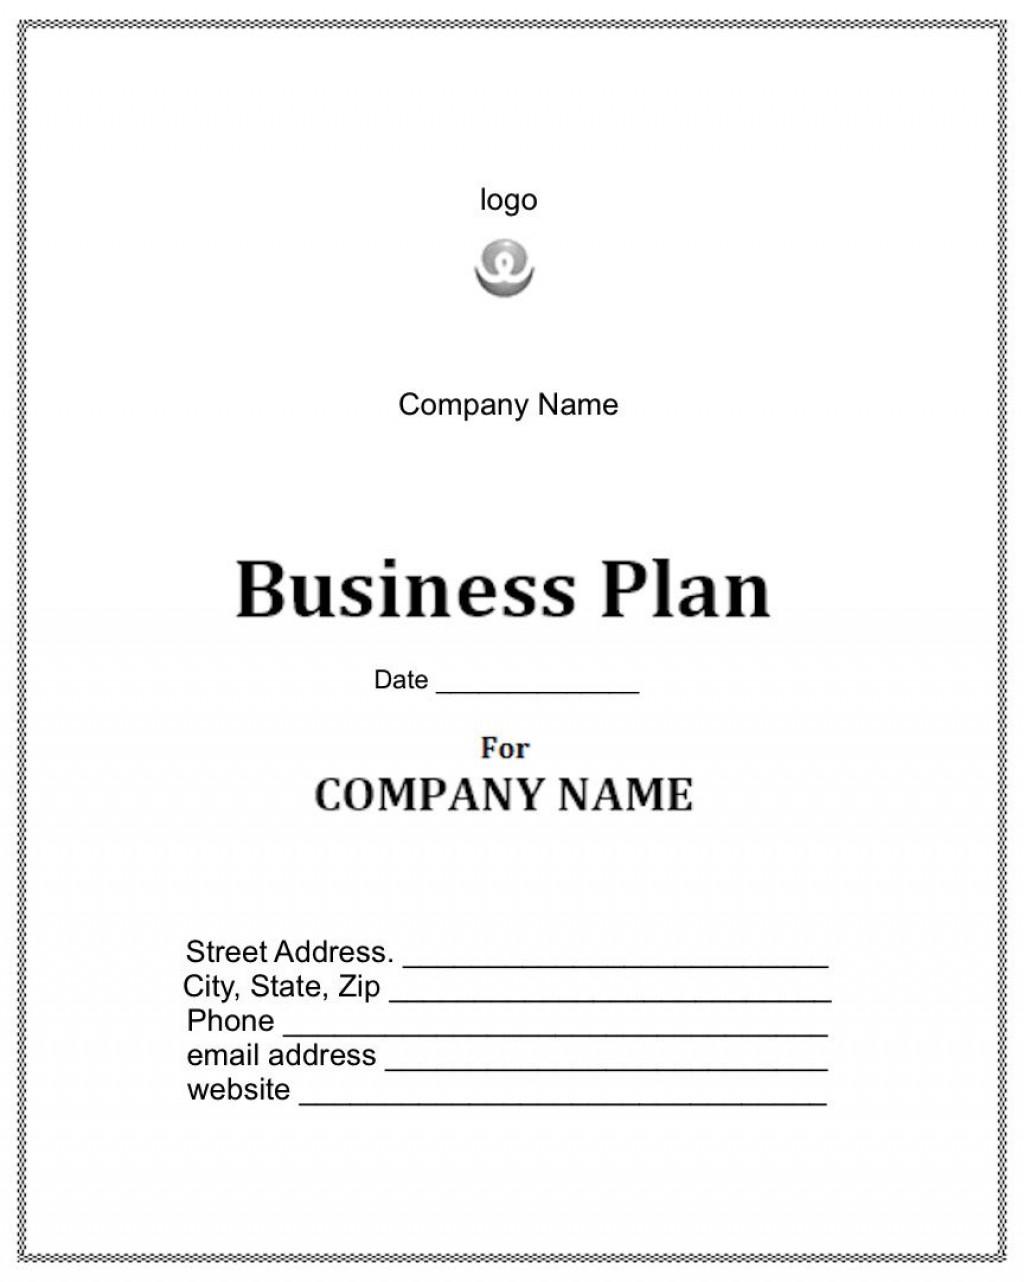 006 Impressive Startup Busines Plan Template Sample  Free Download DocLarge